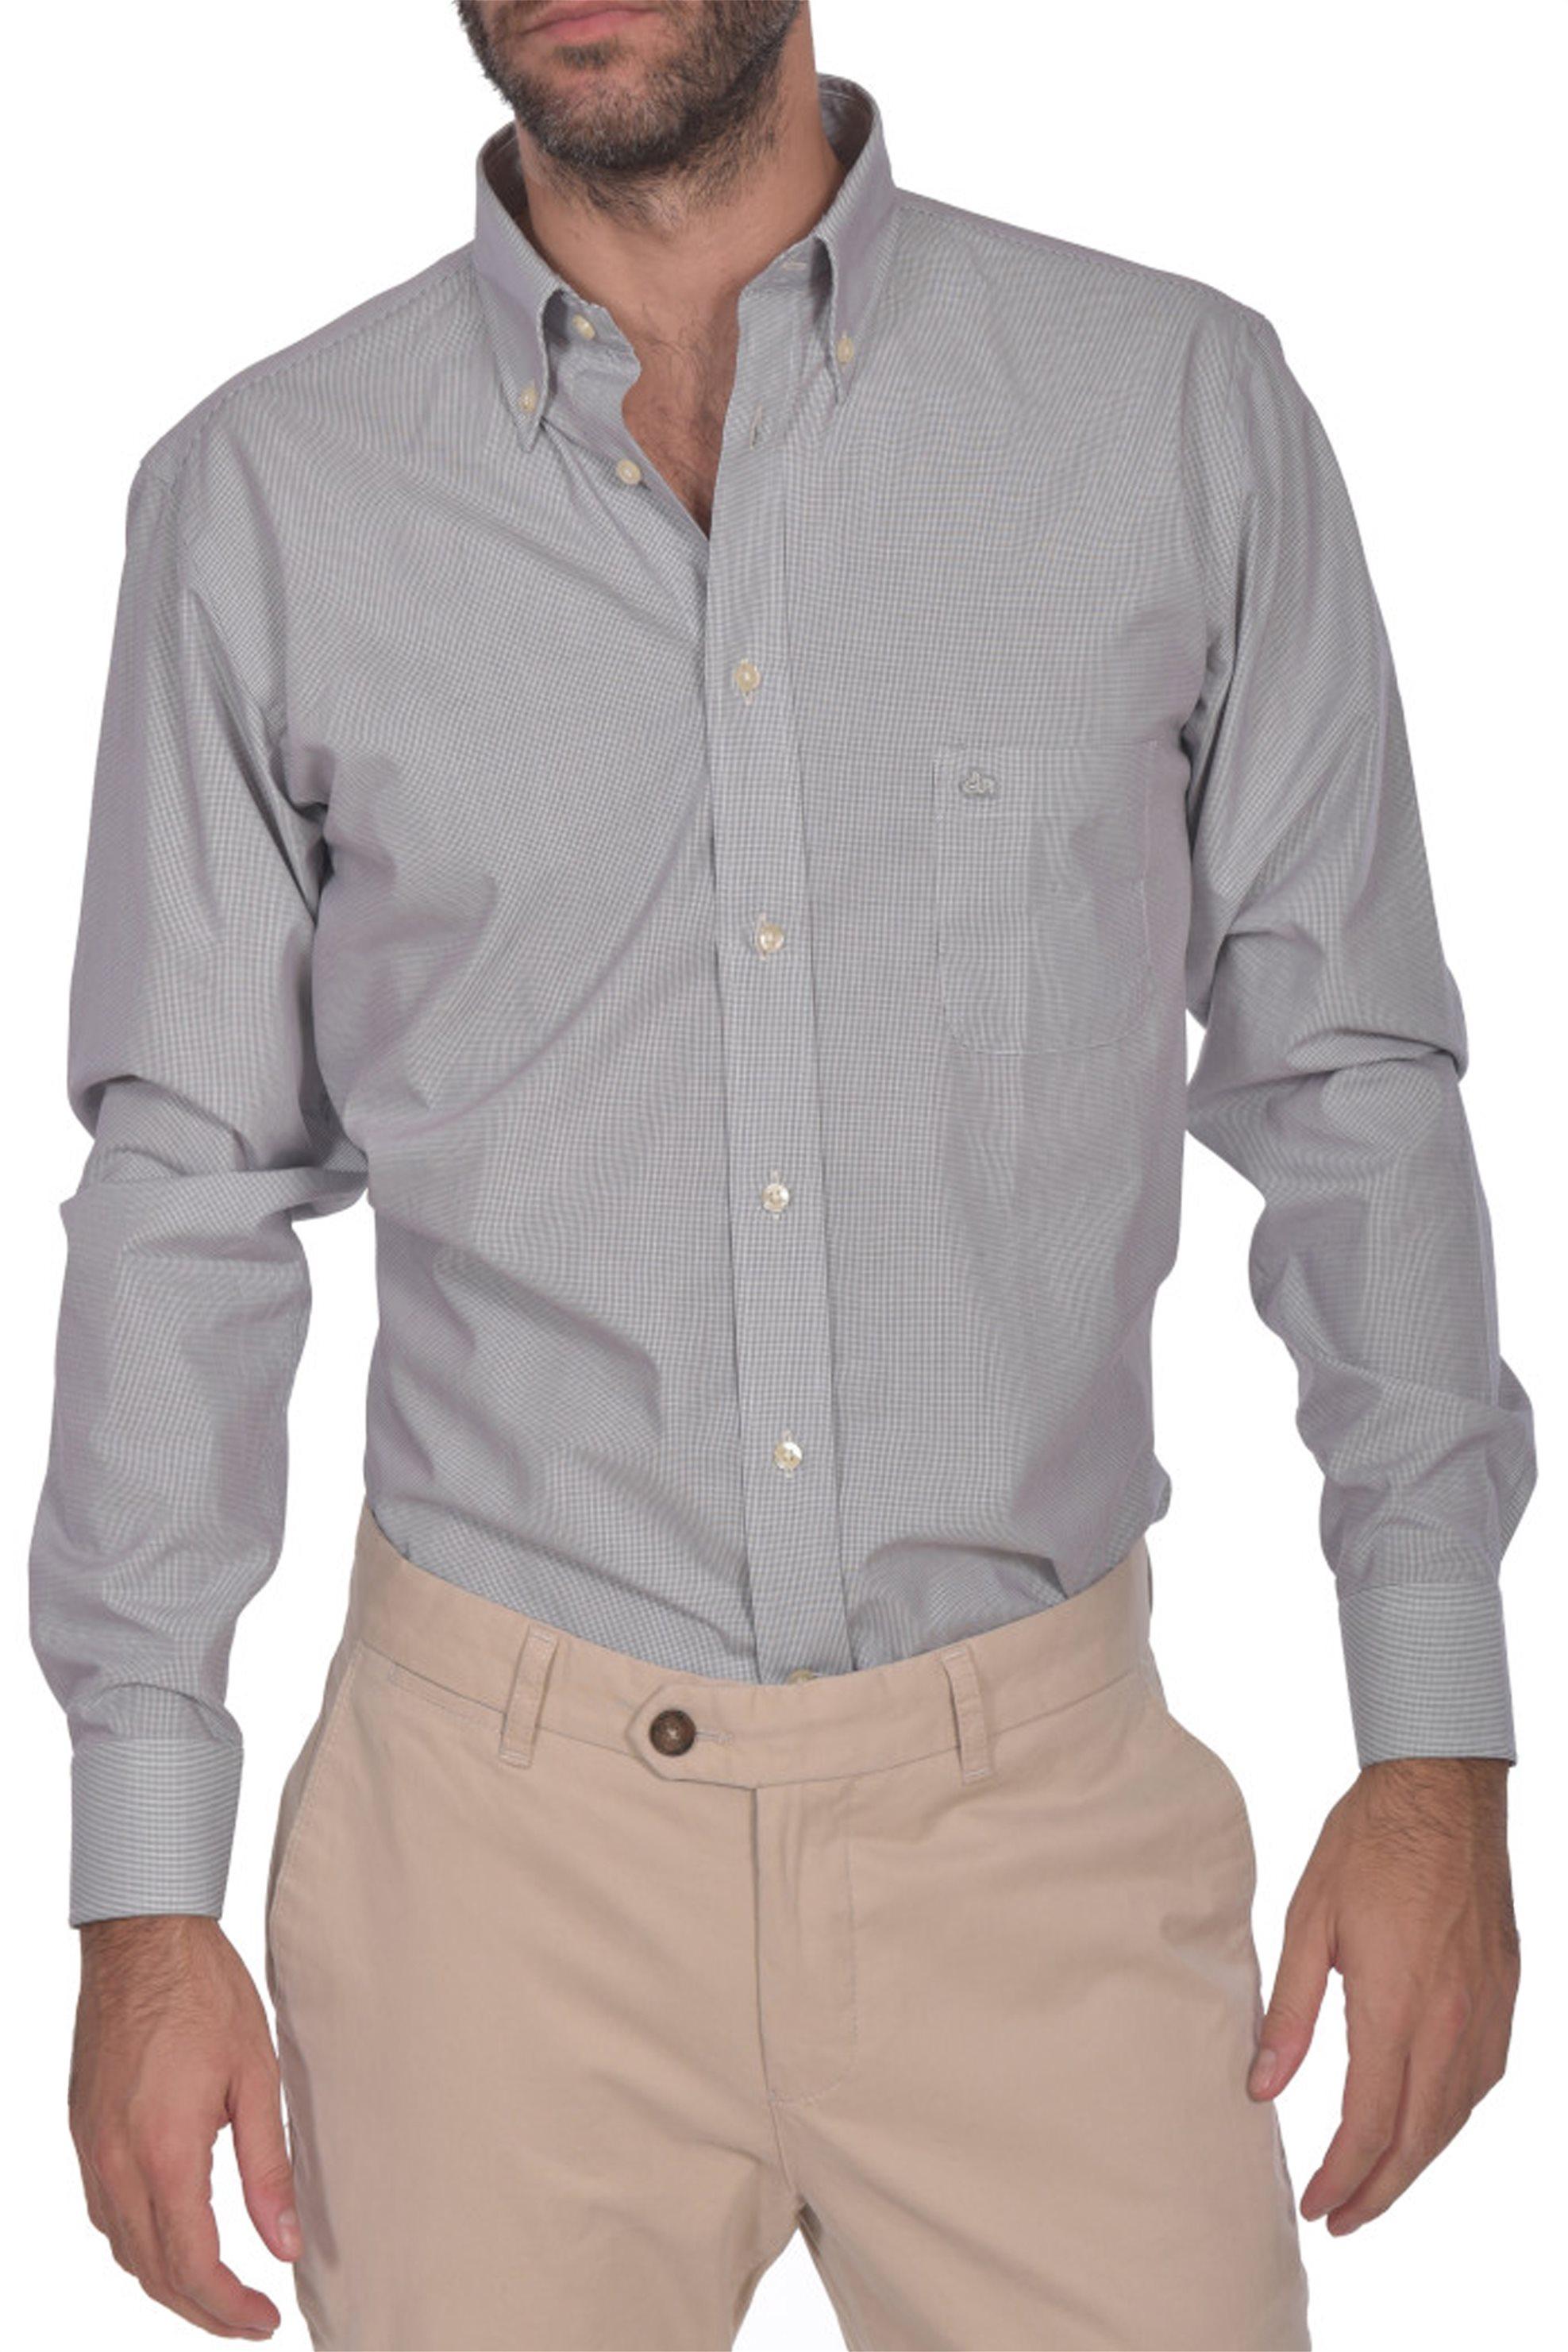 f65f6bf8c2eb Notos Dur ανδρικό πουκάμισο ριγέ button down Regular fit - 10210043 - Γκρι